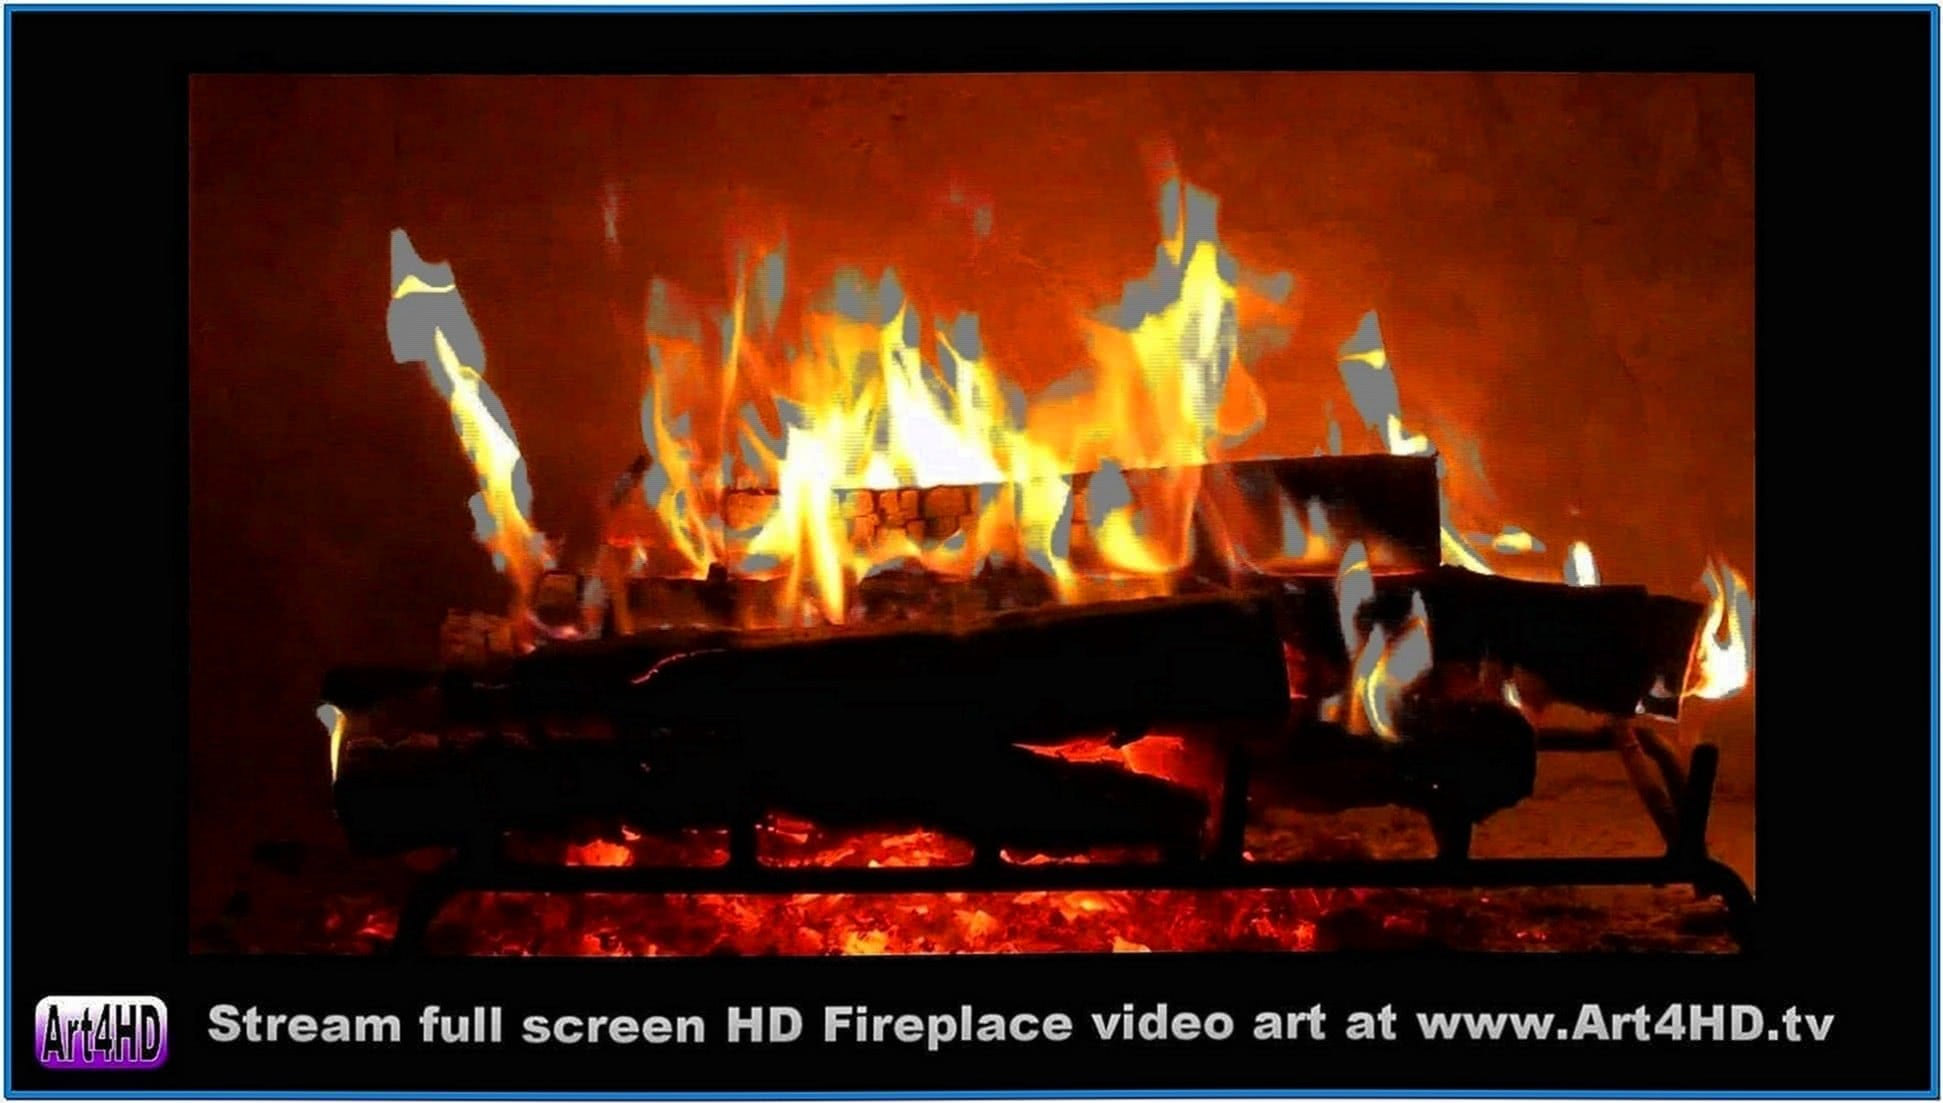 Fireplace tv screensaver - Download free